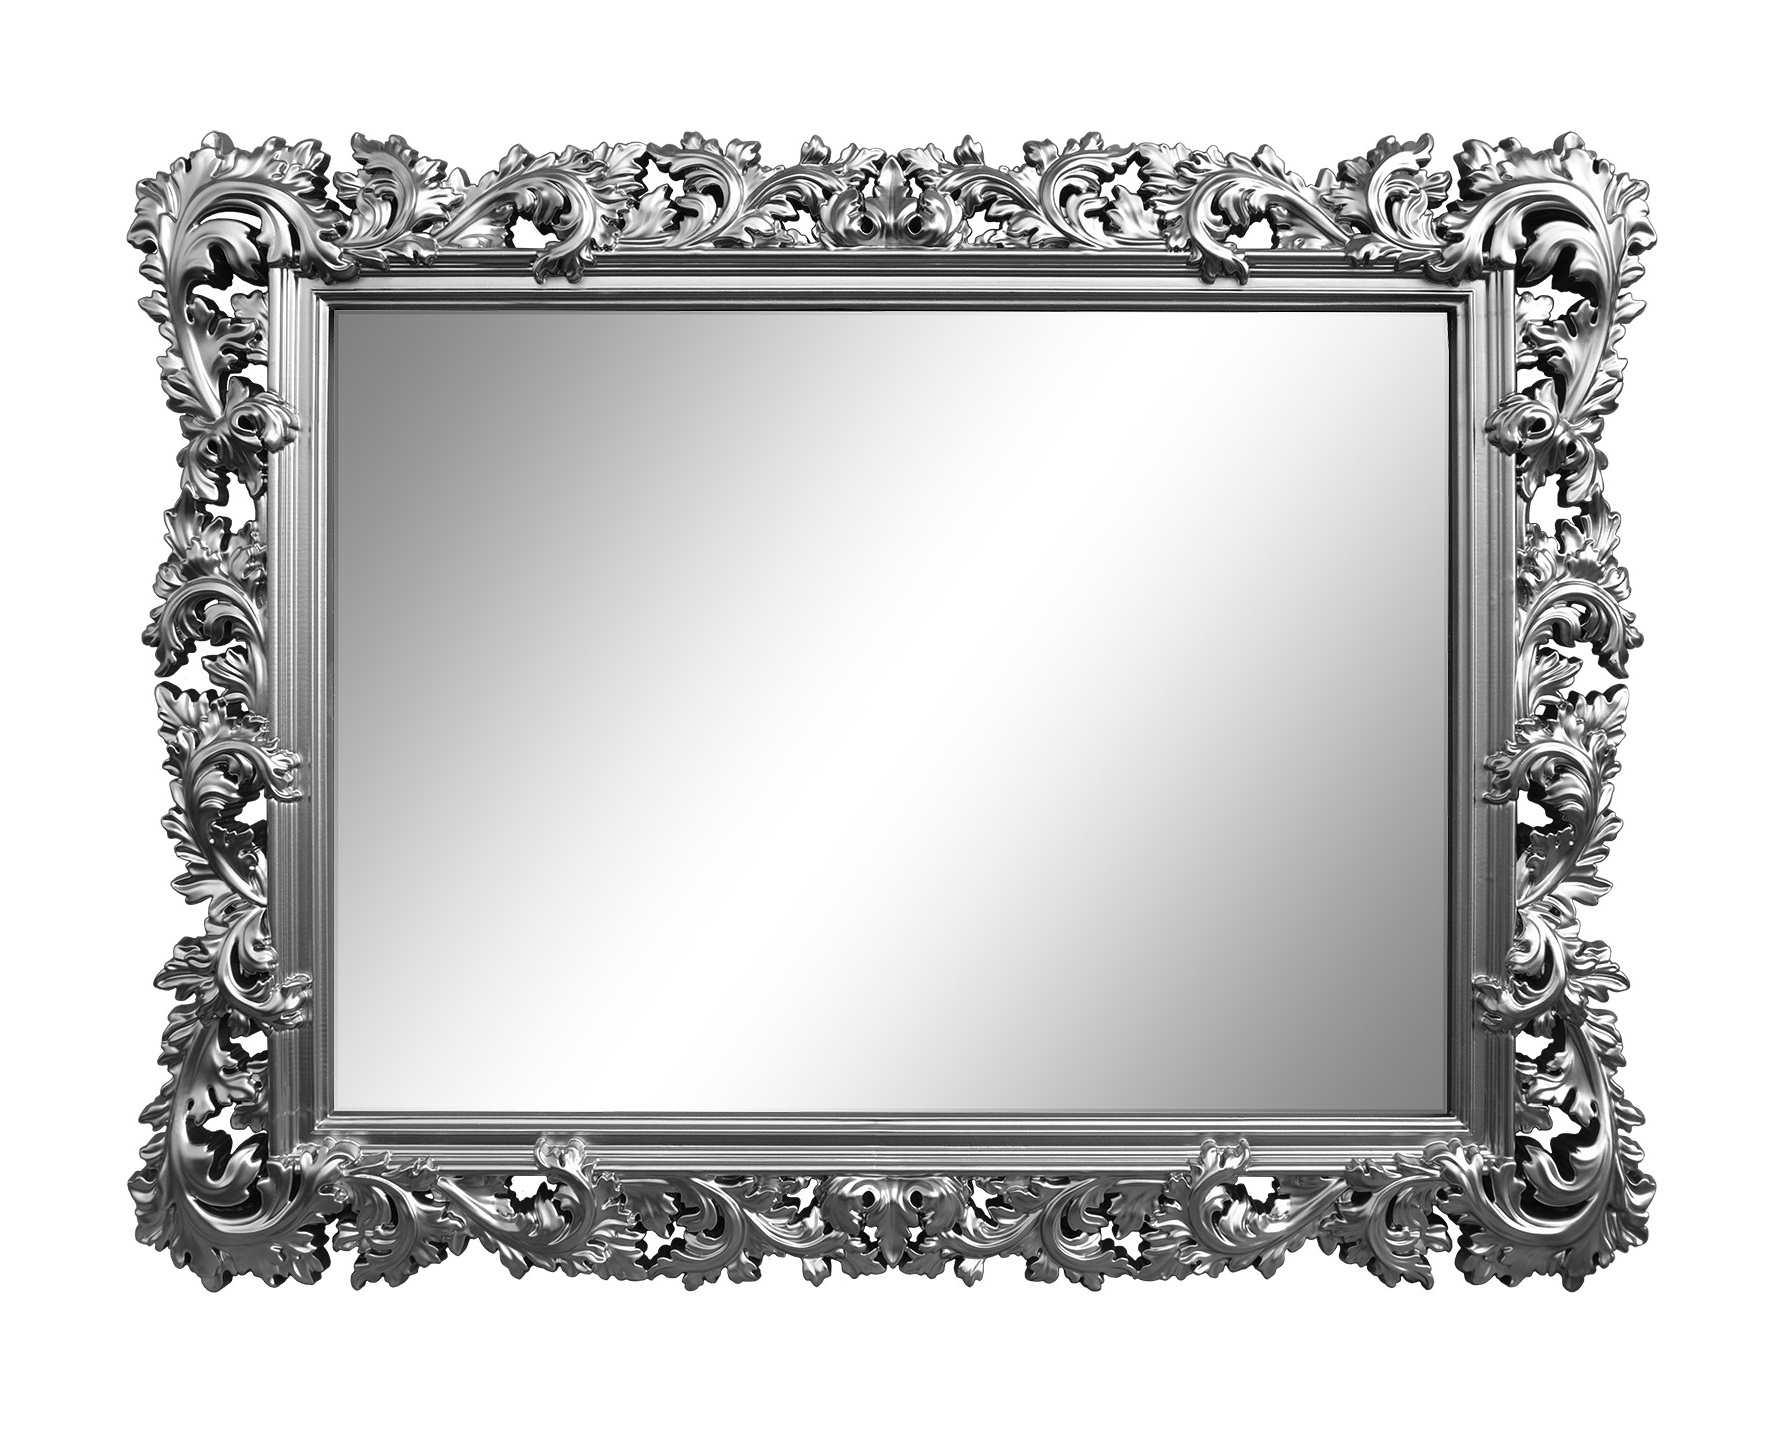 Зеркало АлианаНастенные зеркала<br><br><br>Material: Стекло<br>Ширина см: 115<br>Высота см: 88<br>Глубина см: 4